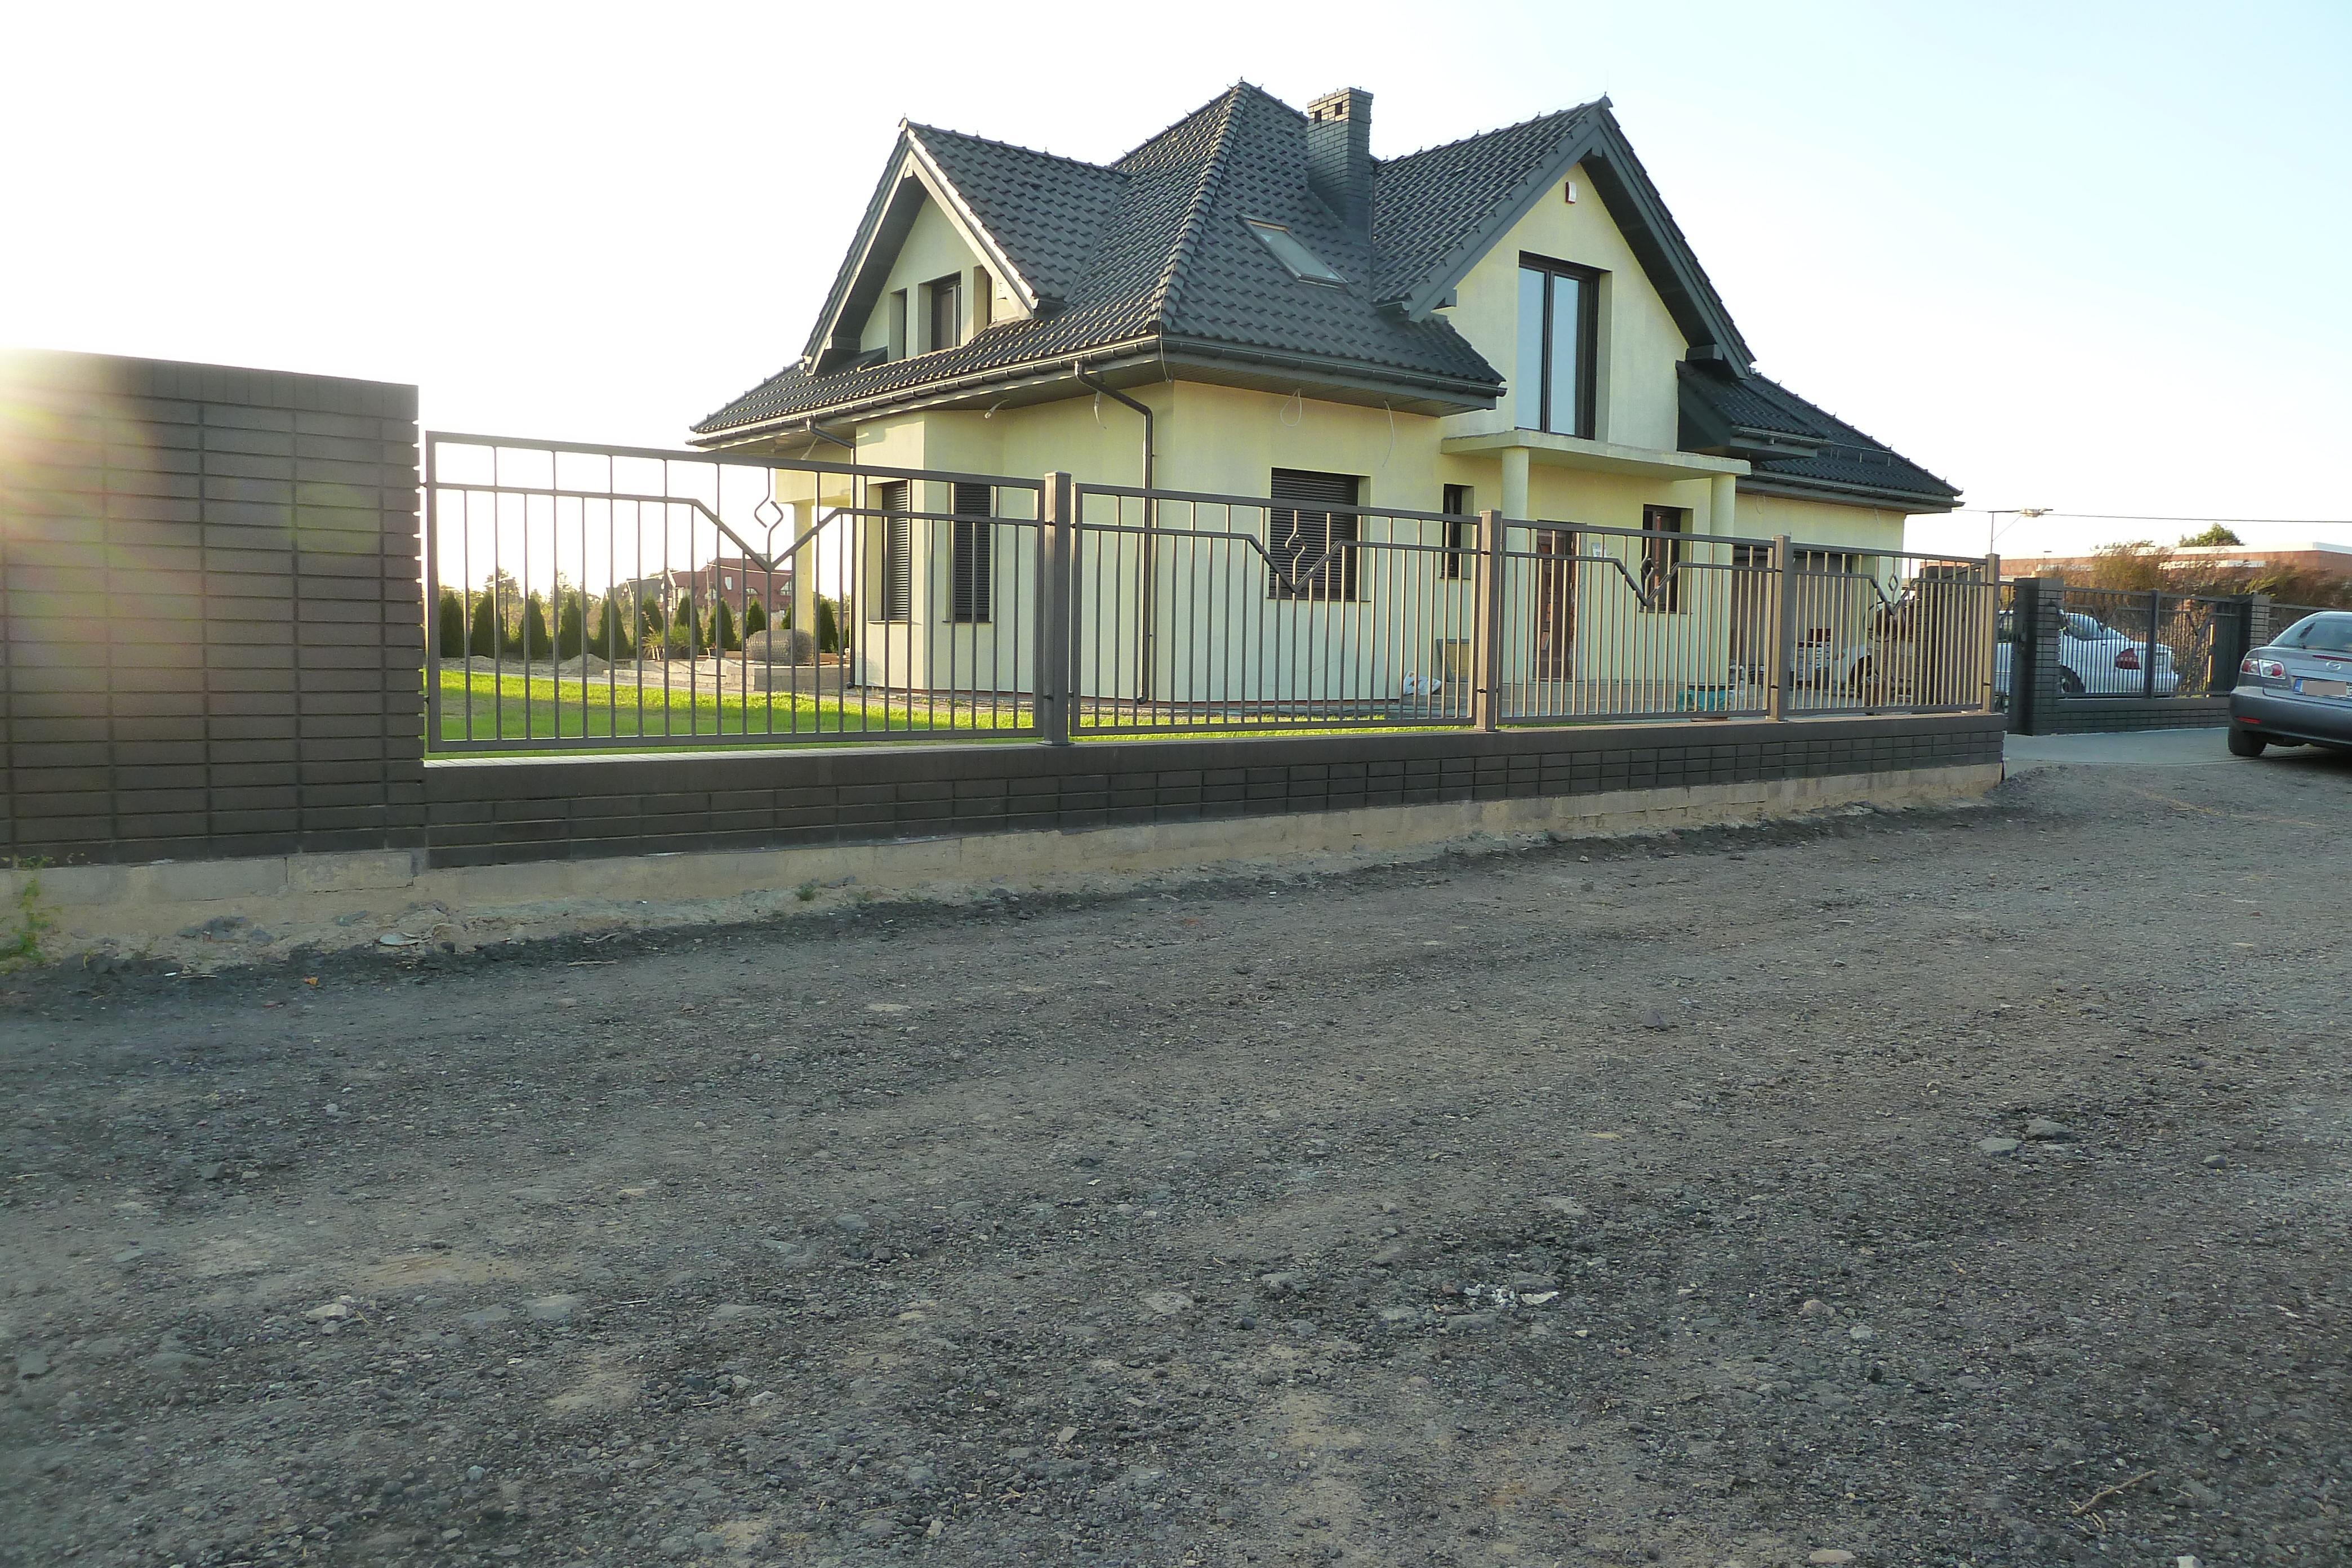 malgorzata-warzynska-magiera-133525312855.jpg